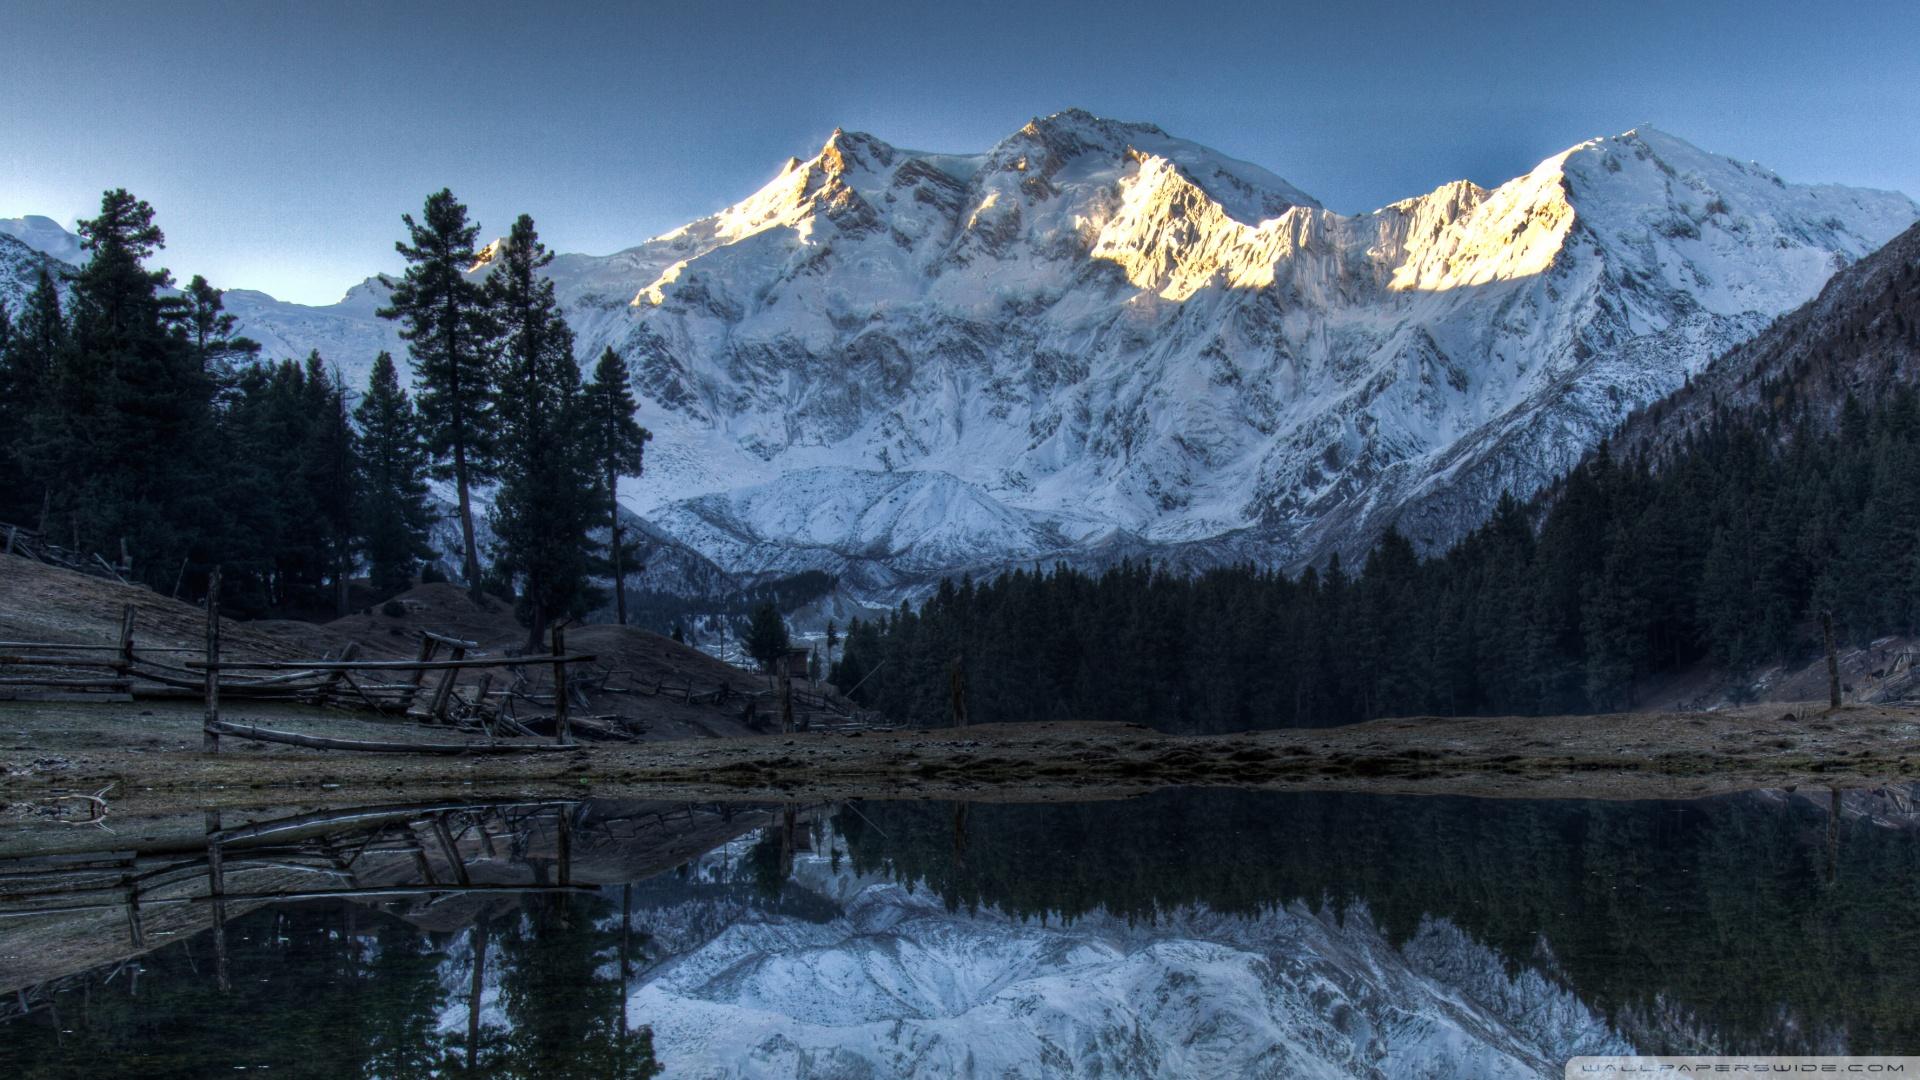 Peaks In Himalaya Wallpaper 1920x1080 Peaks In Himalaya 1920x1080